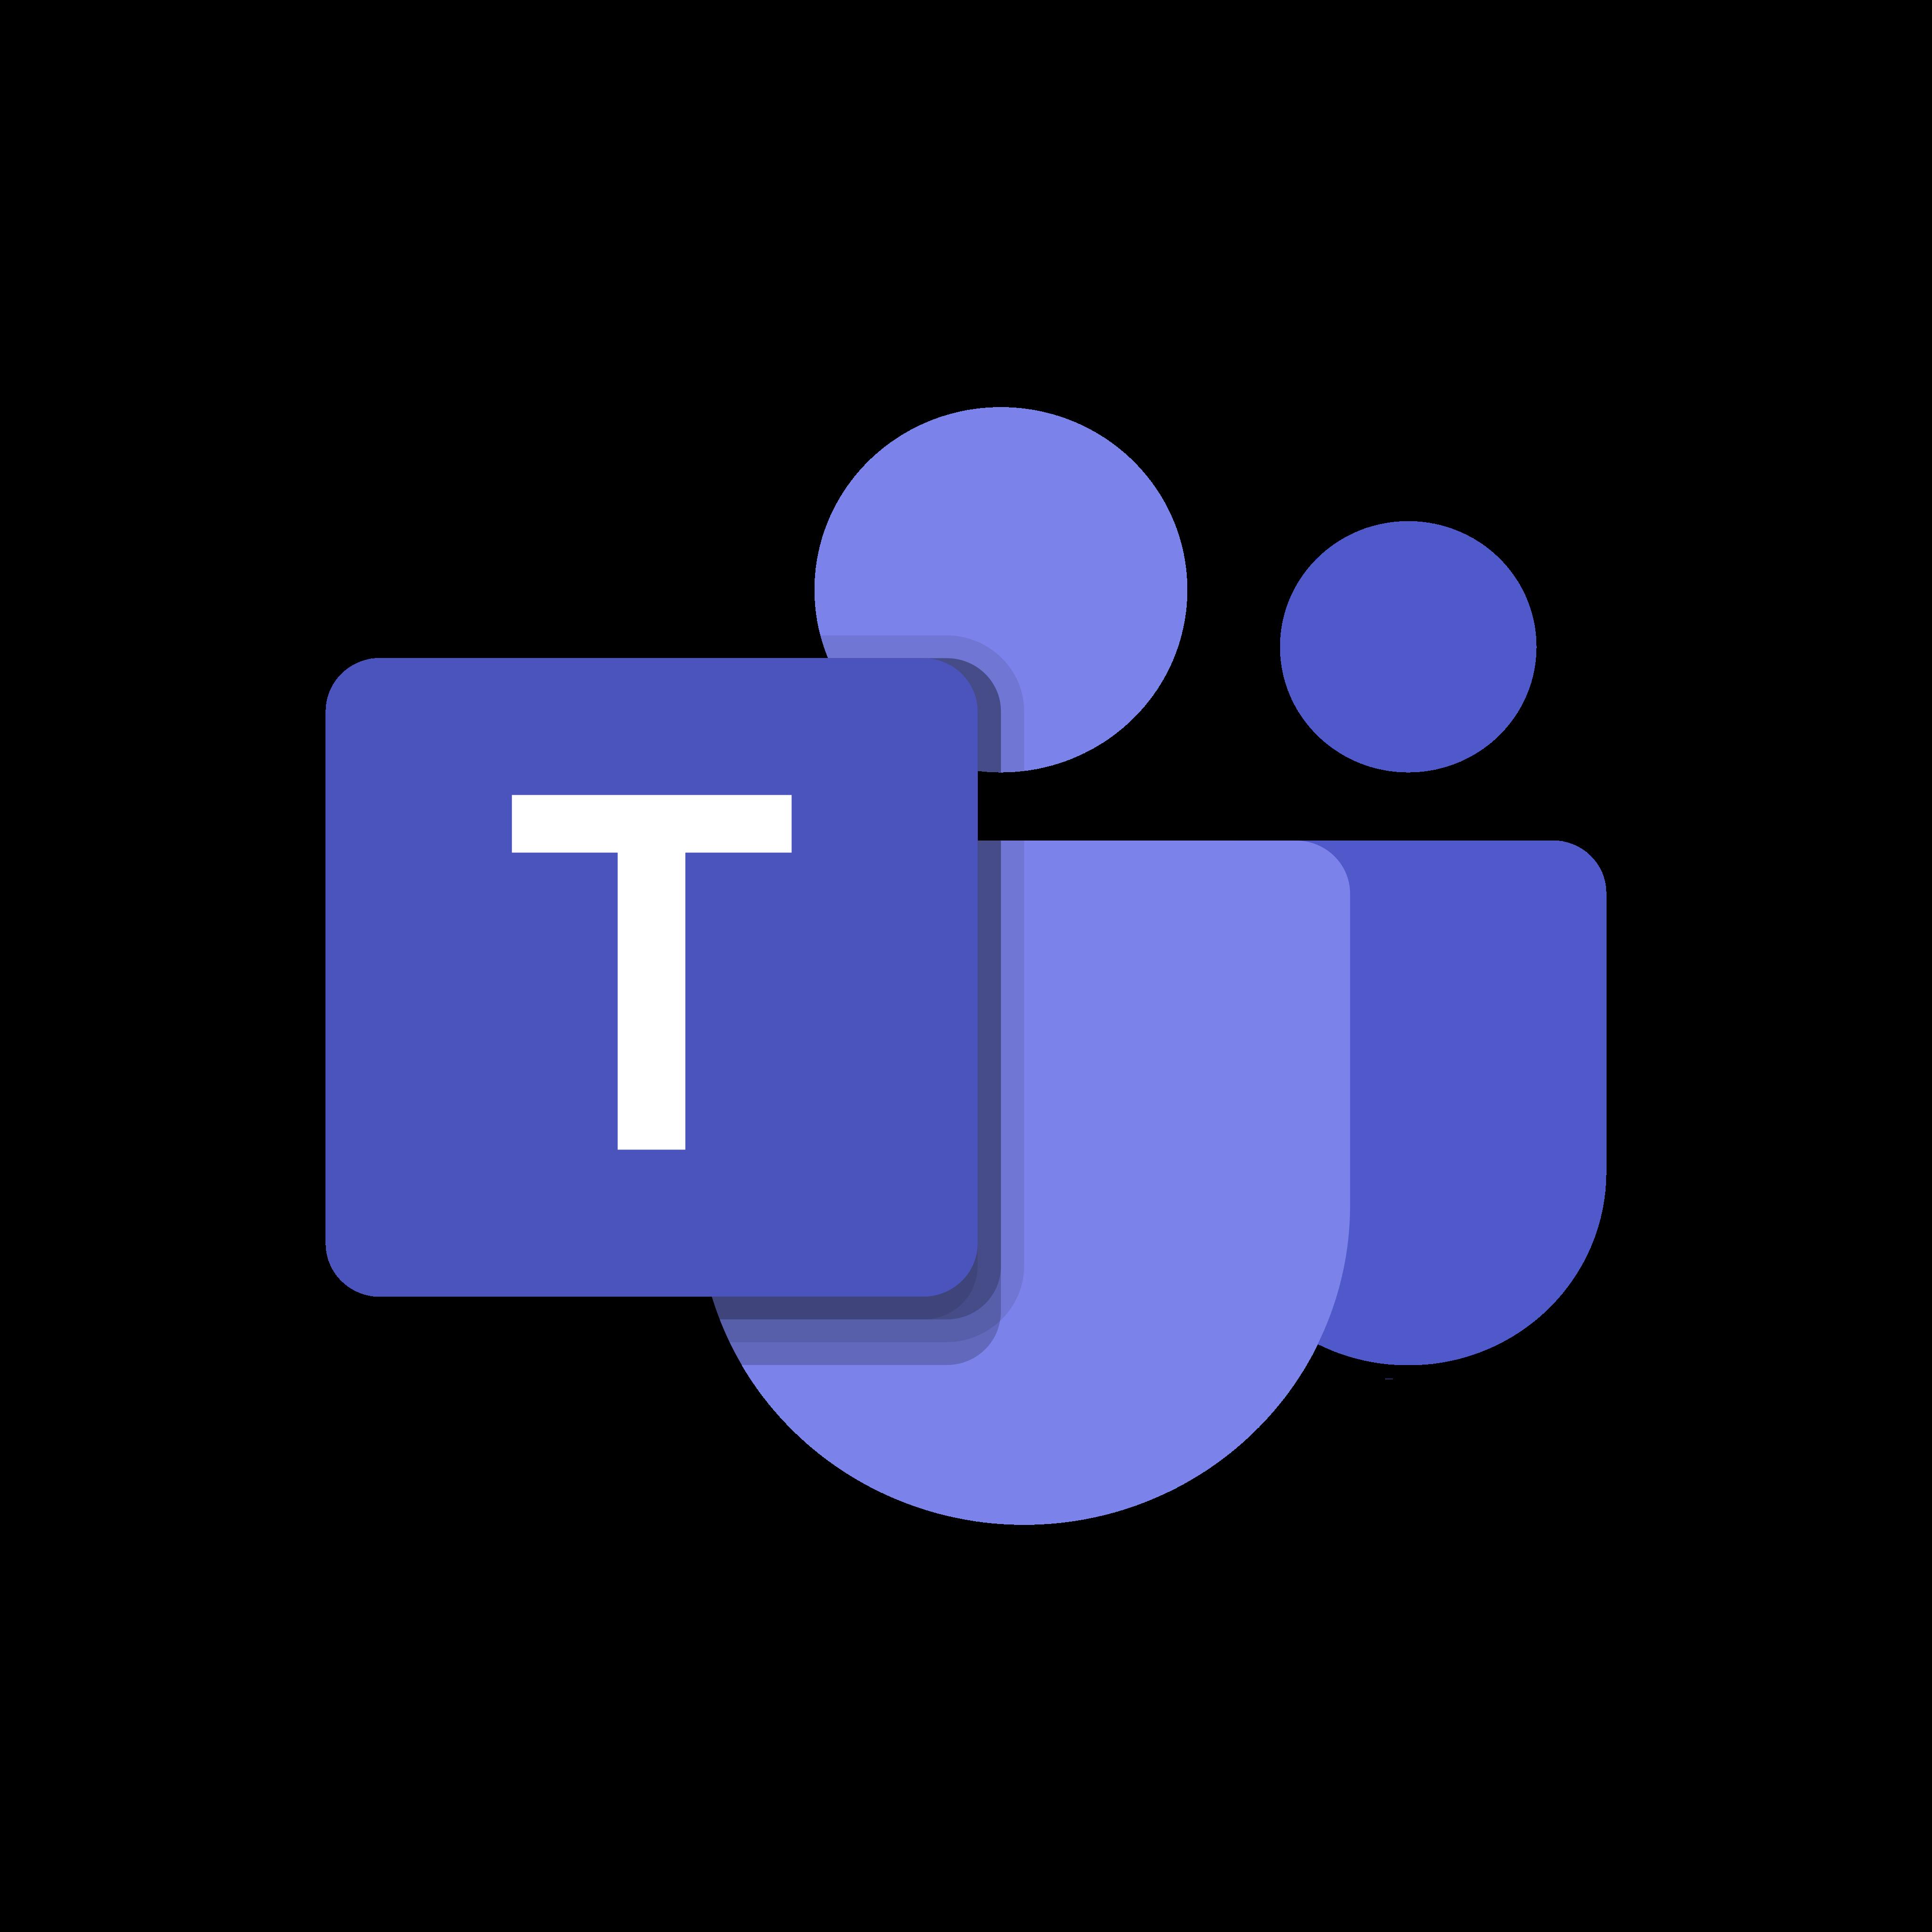 microsoft teams logo 0 - Microsoft Teams Logo